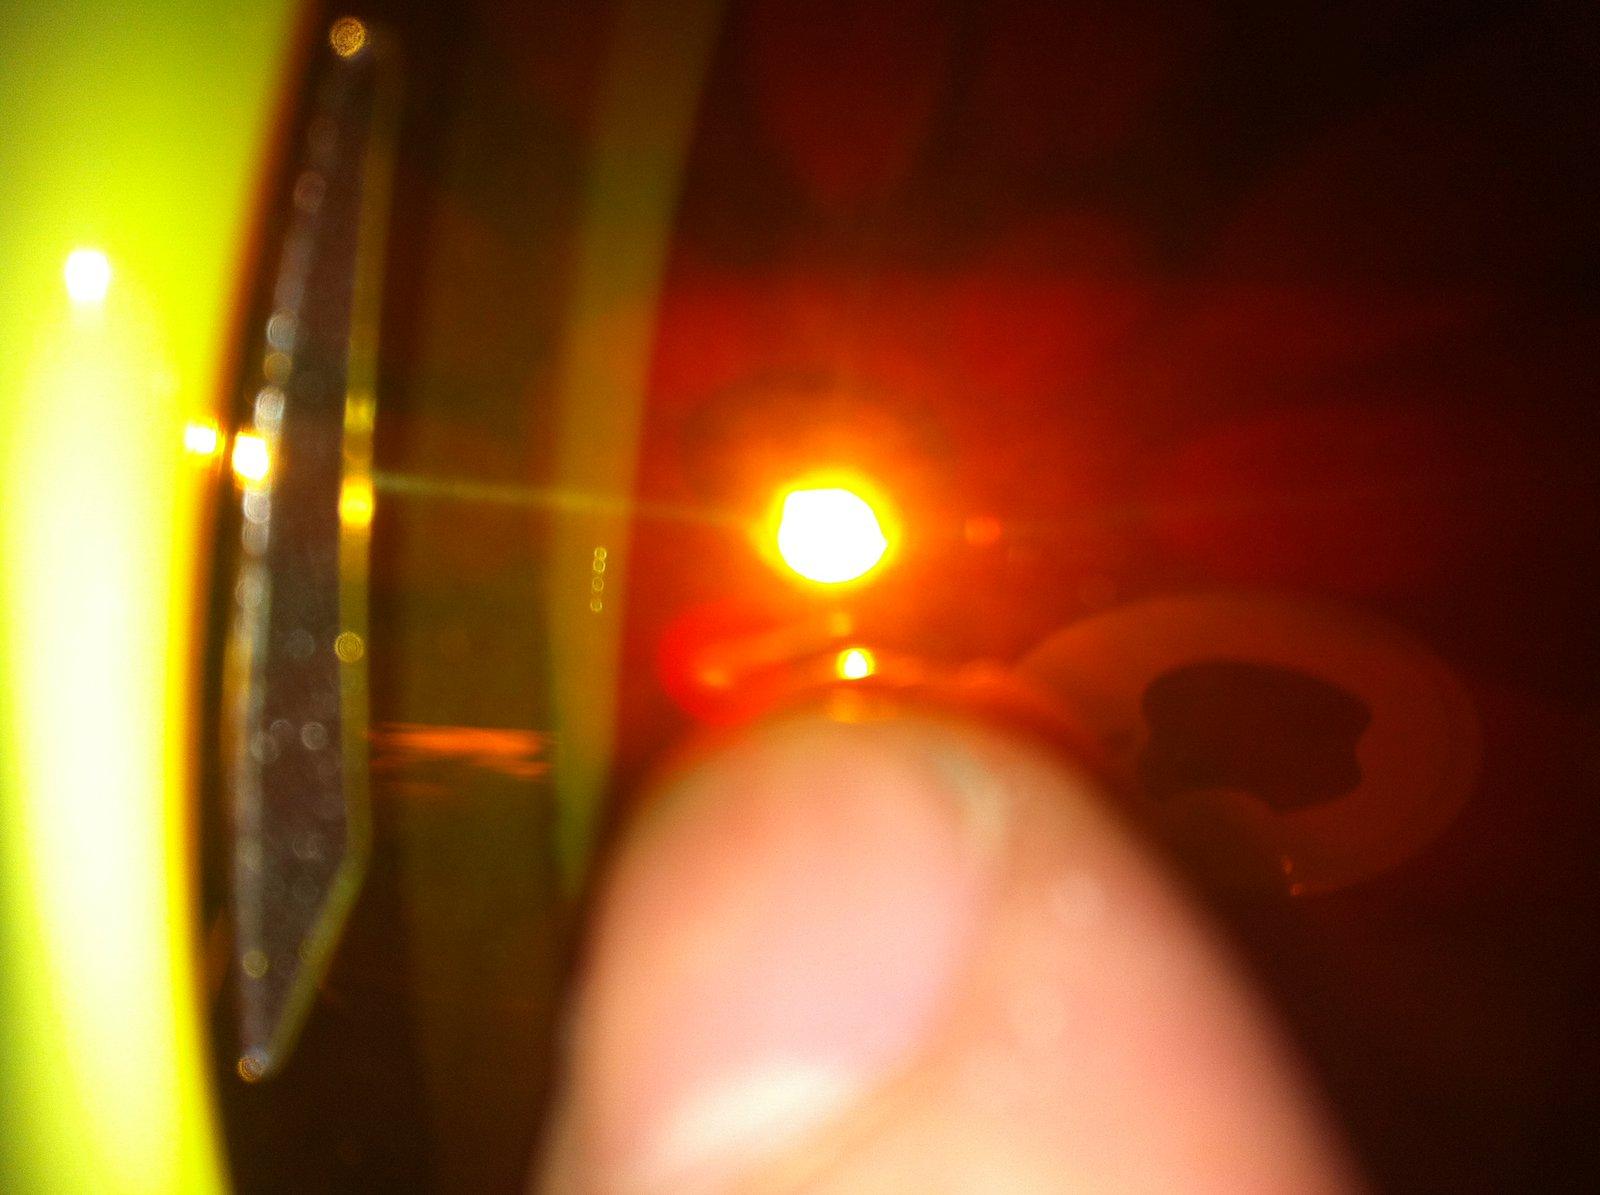 scratch on lense